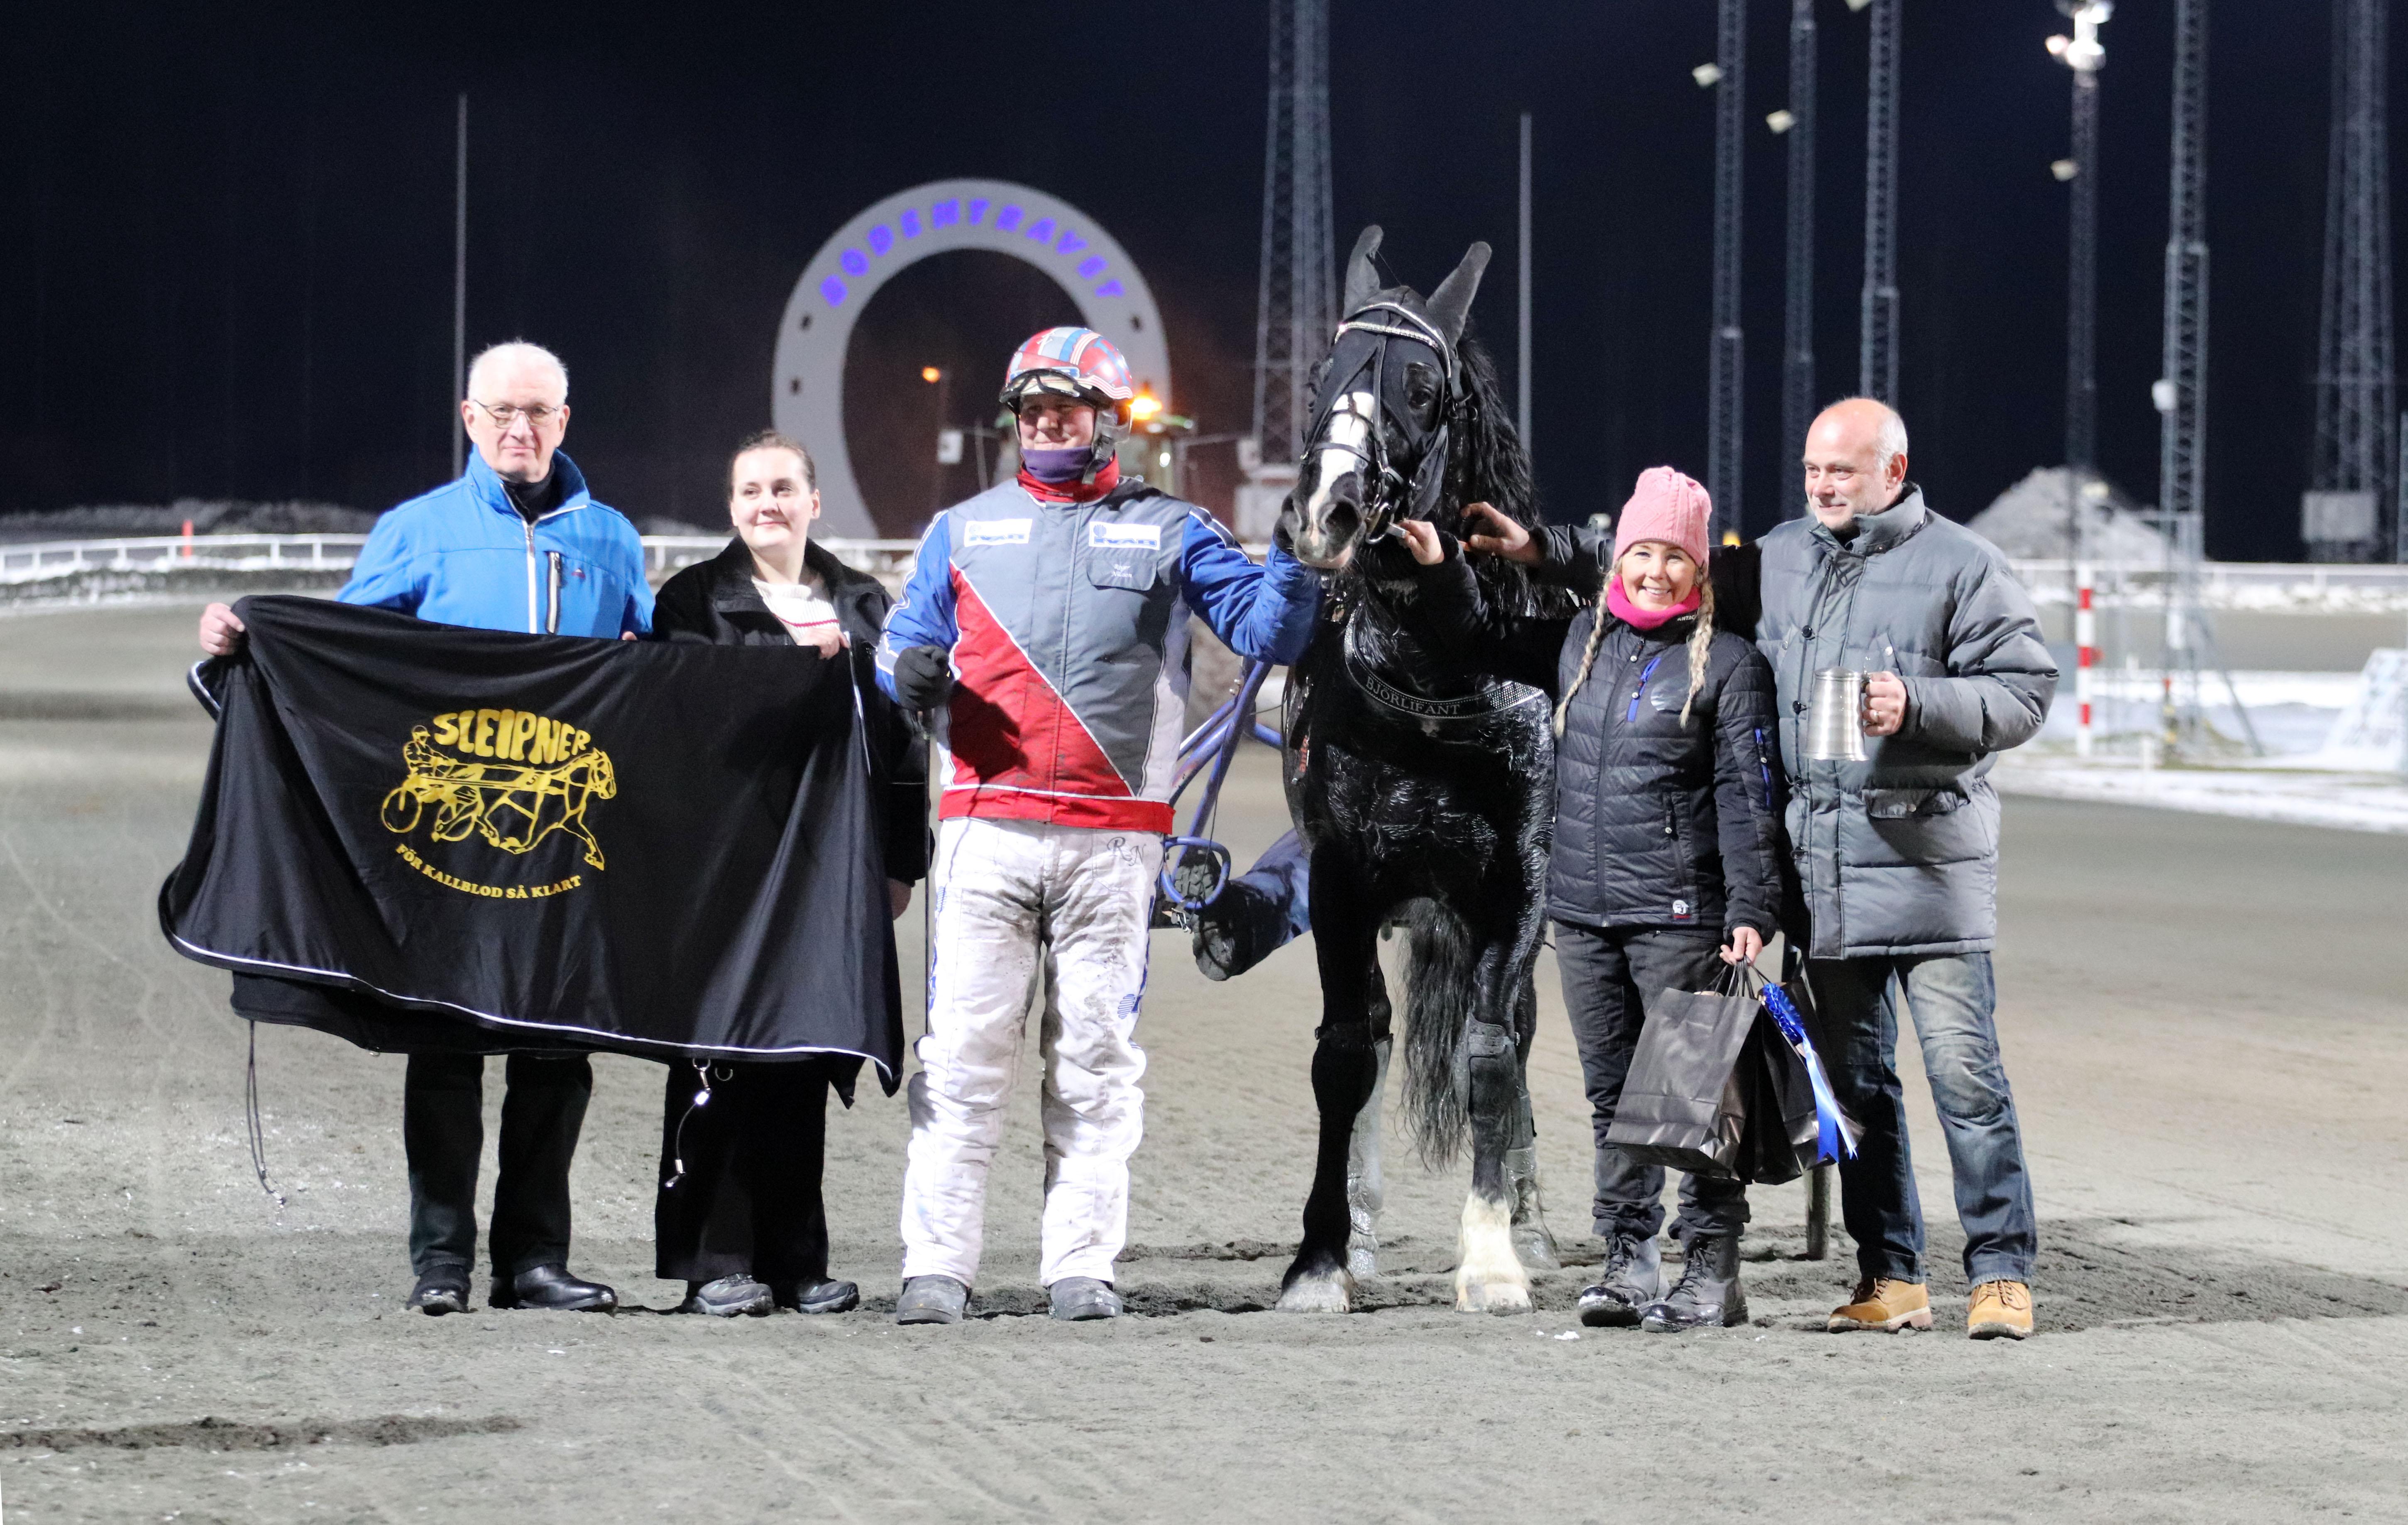 Dubbelt Nilsson i kannorna, Ove och Hanna champions!